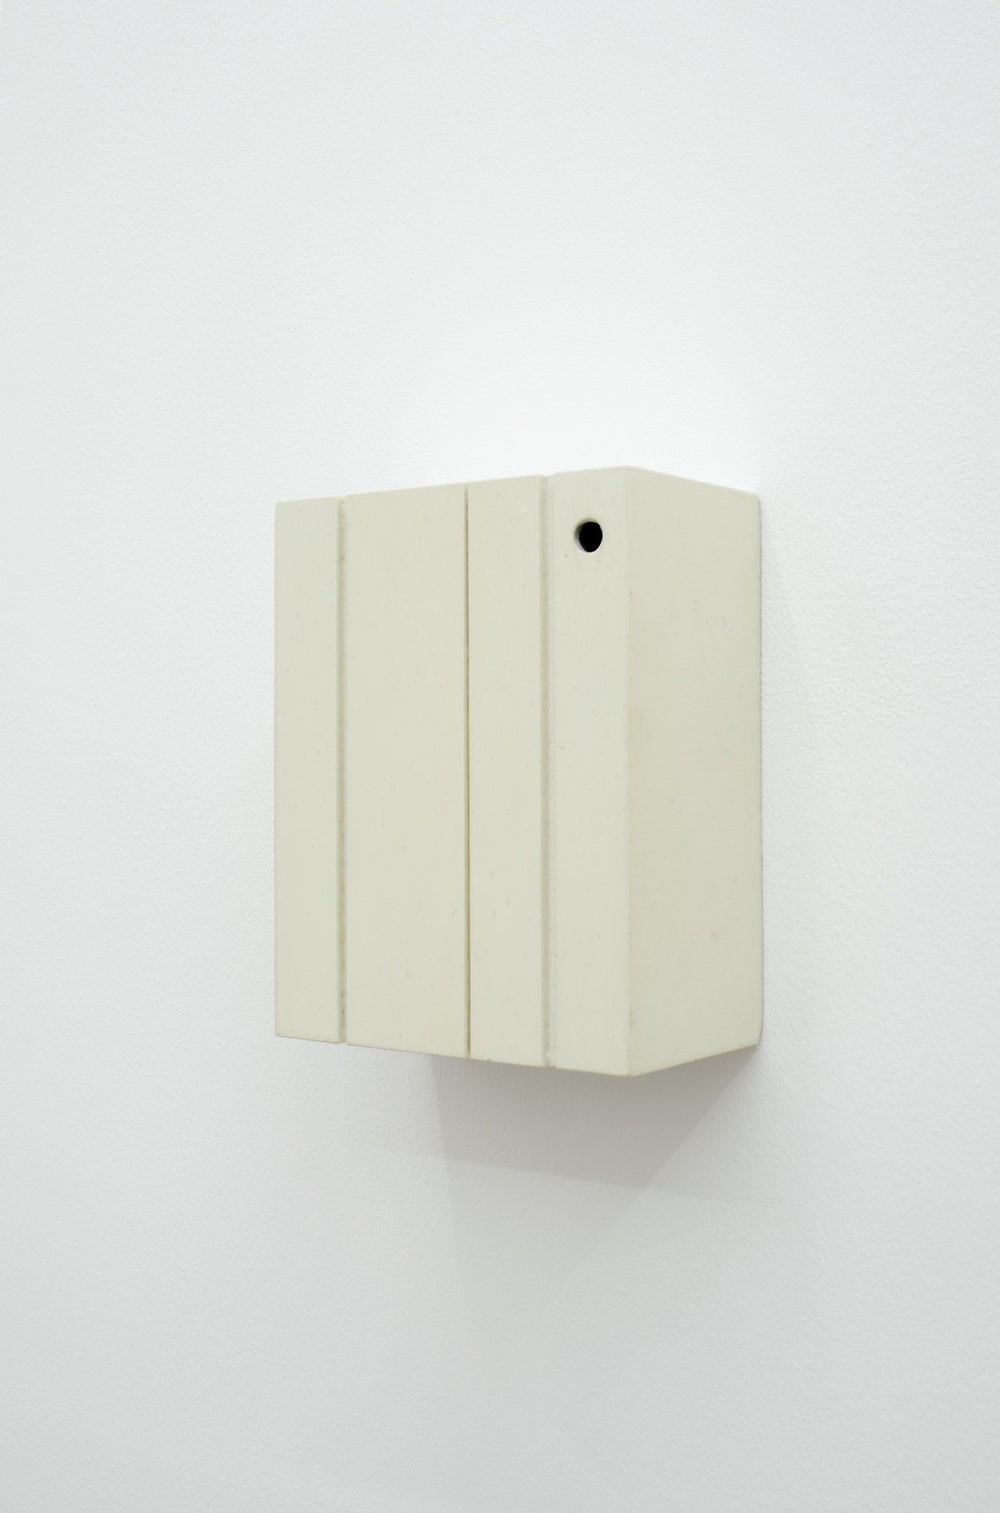 Blob Discovery , 2014, PVC, acrylic paint, lacquer, 13 x 16.5 x 7.5. cm.